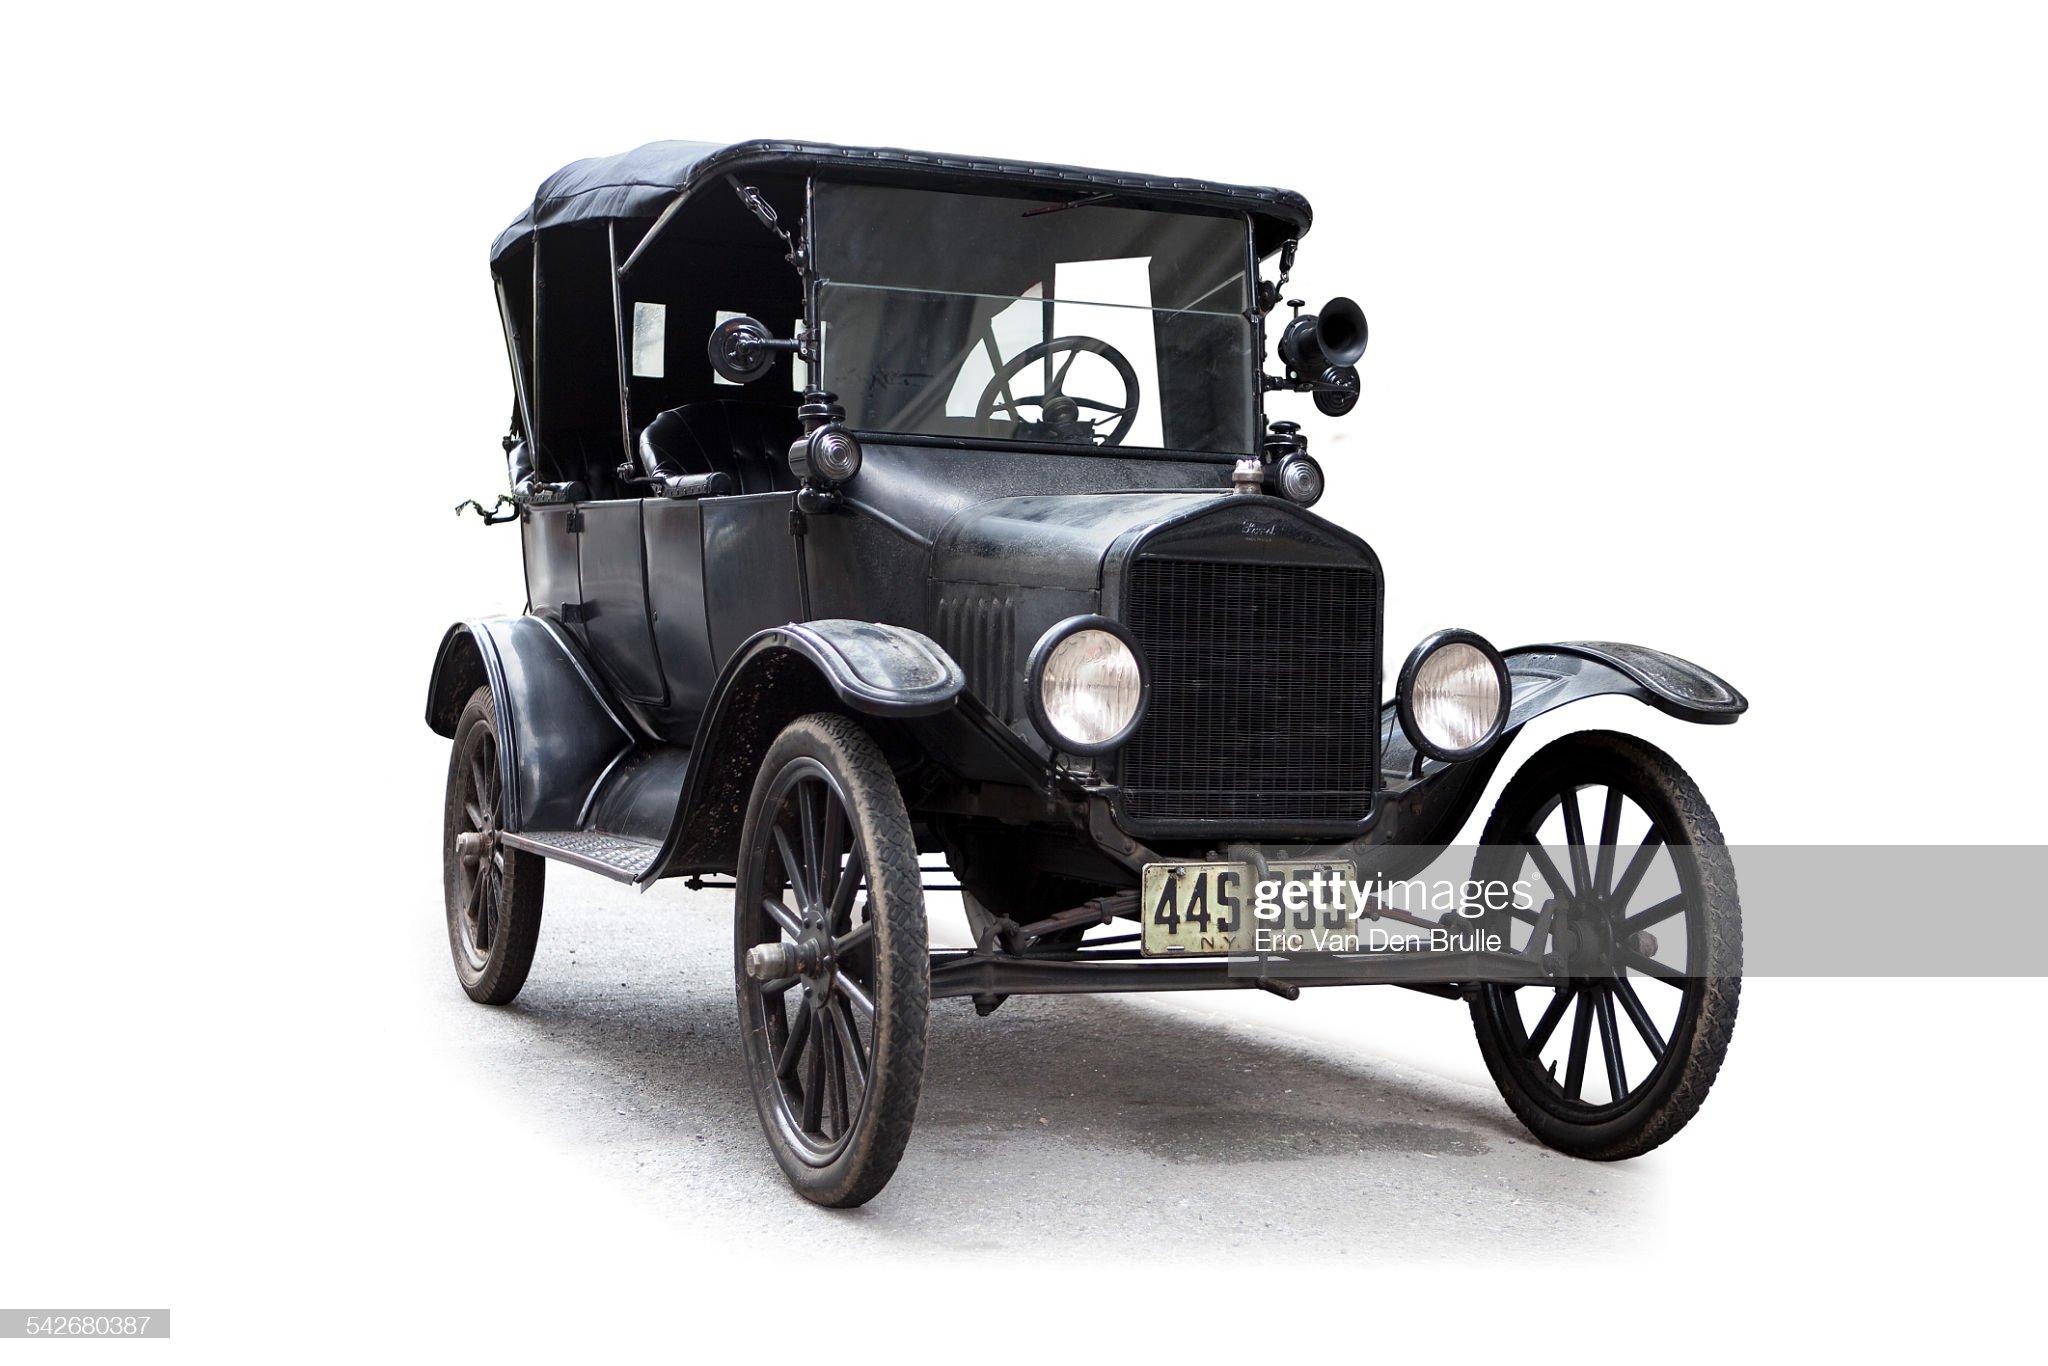 dream sybol the car